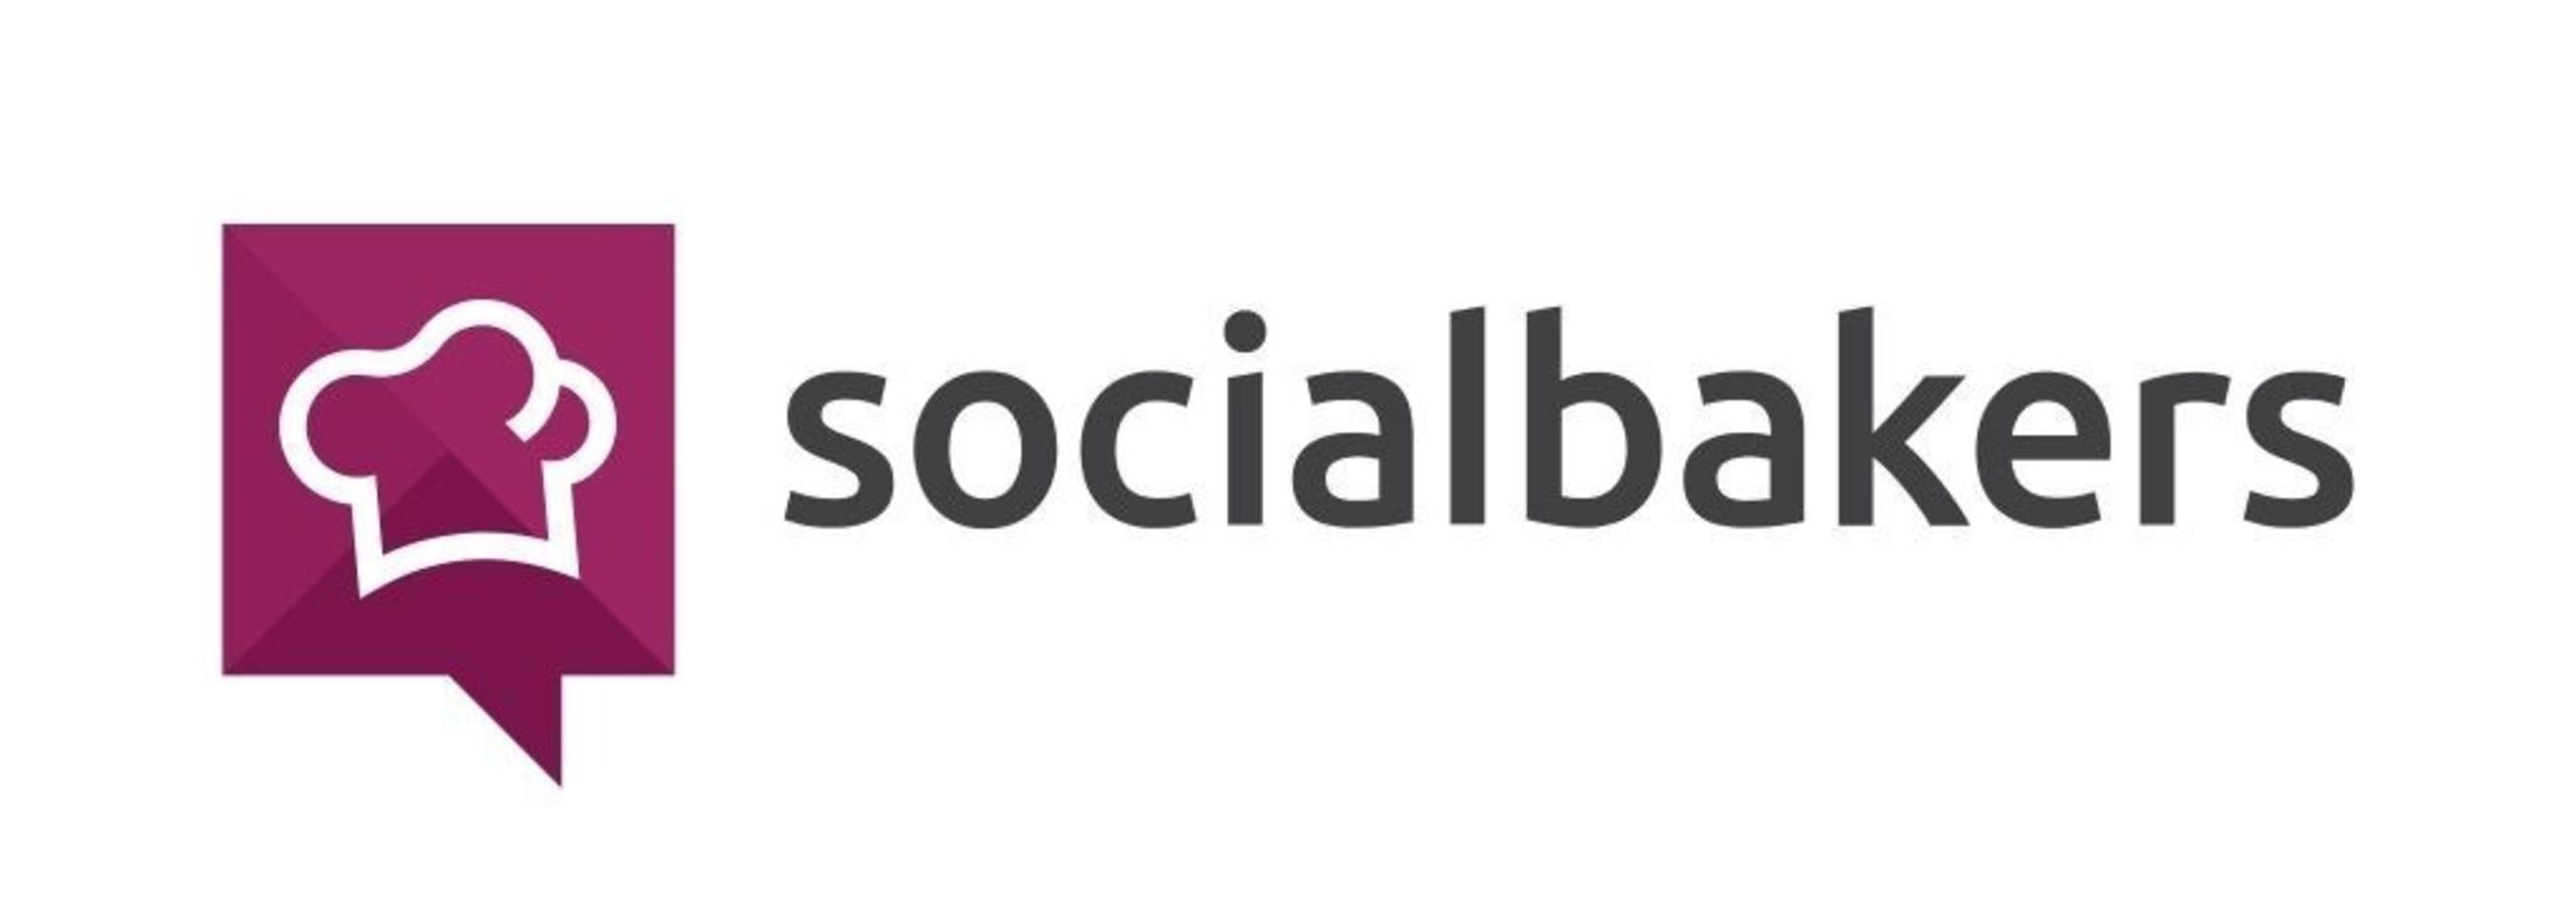 Socialbakers Becomes a Statista Data Partner